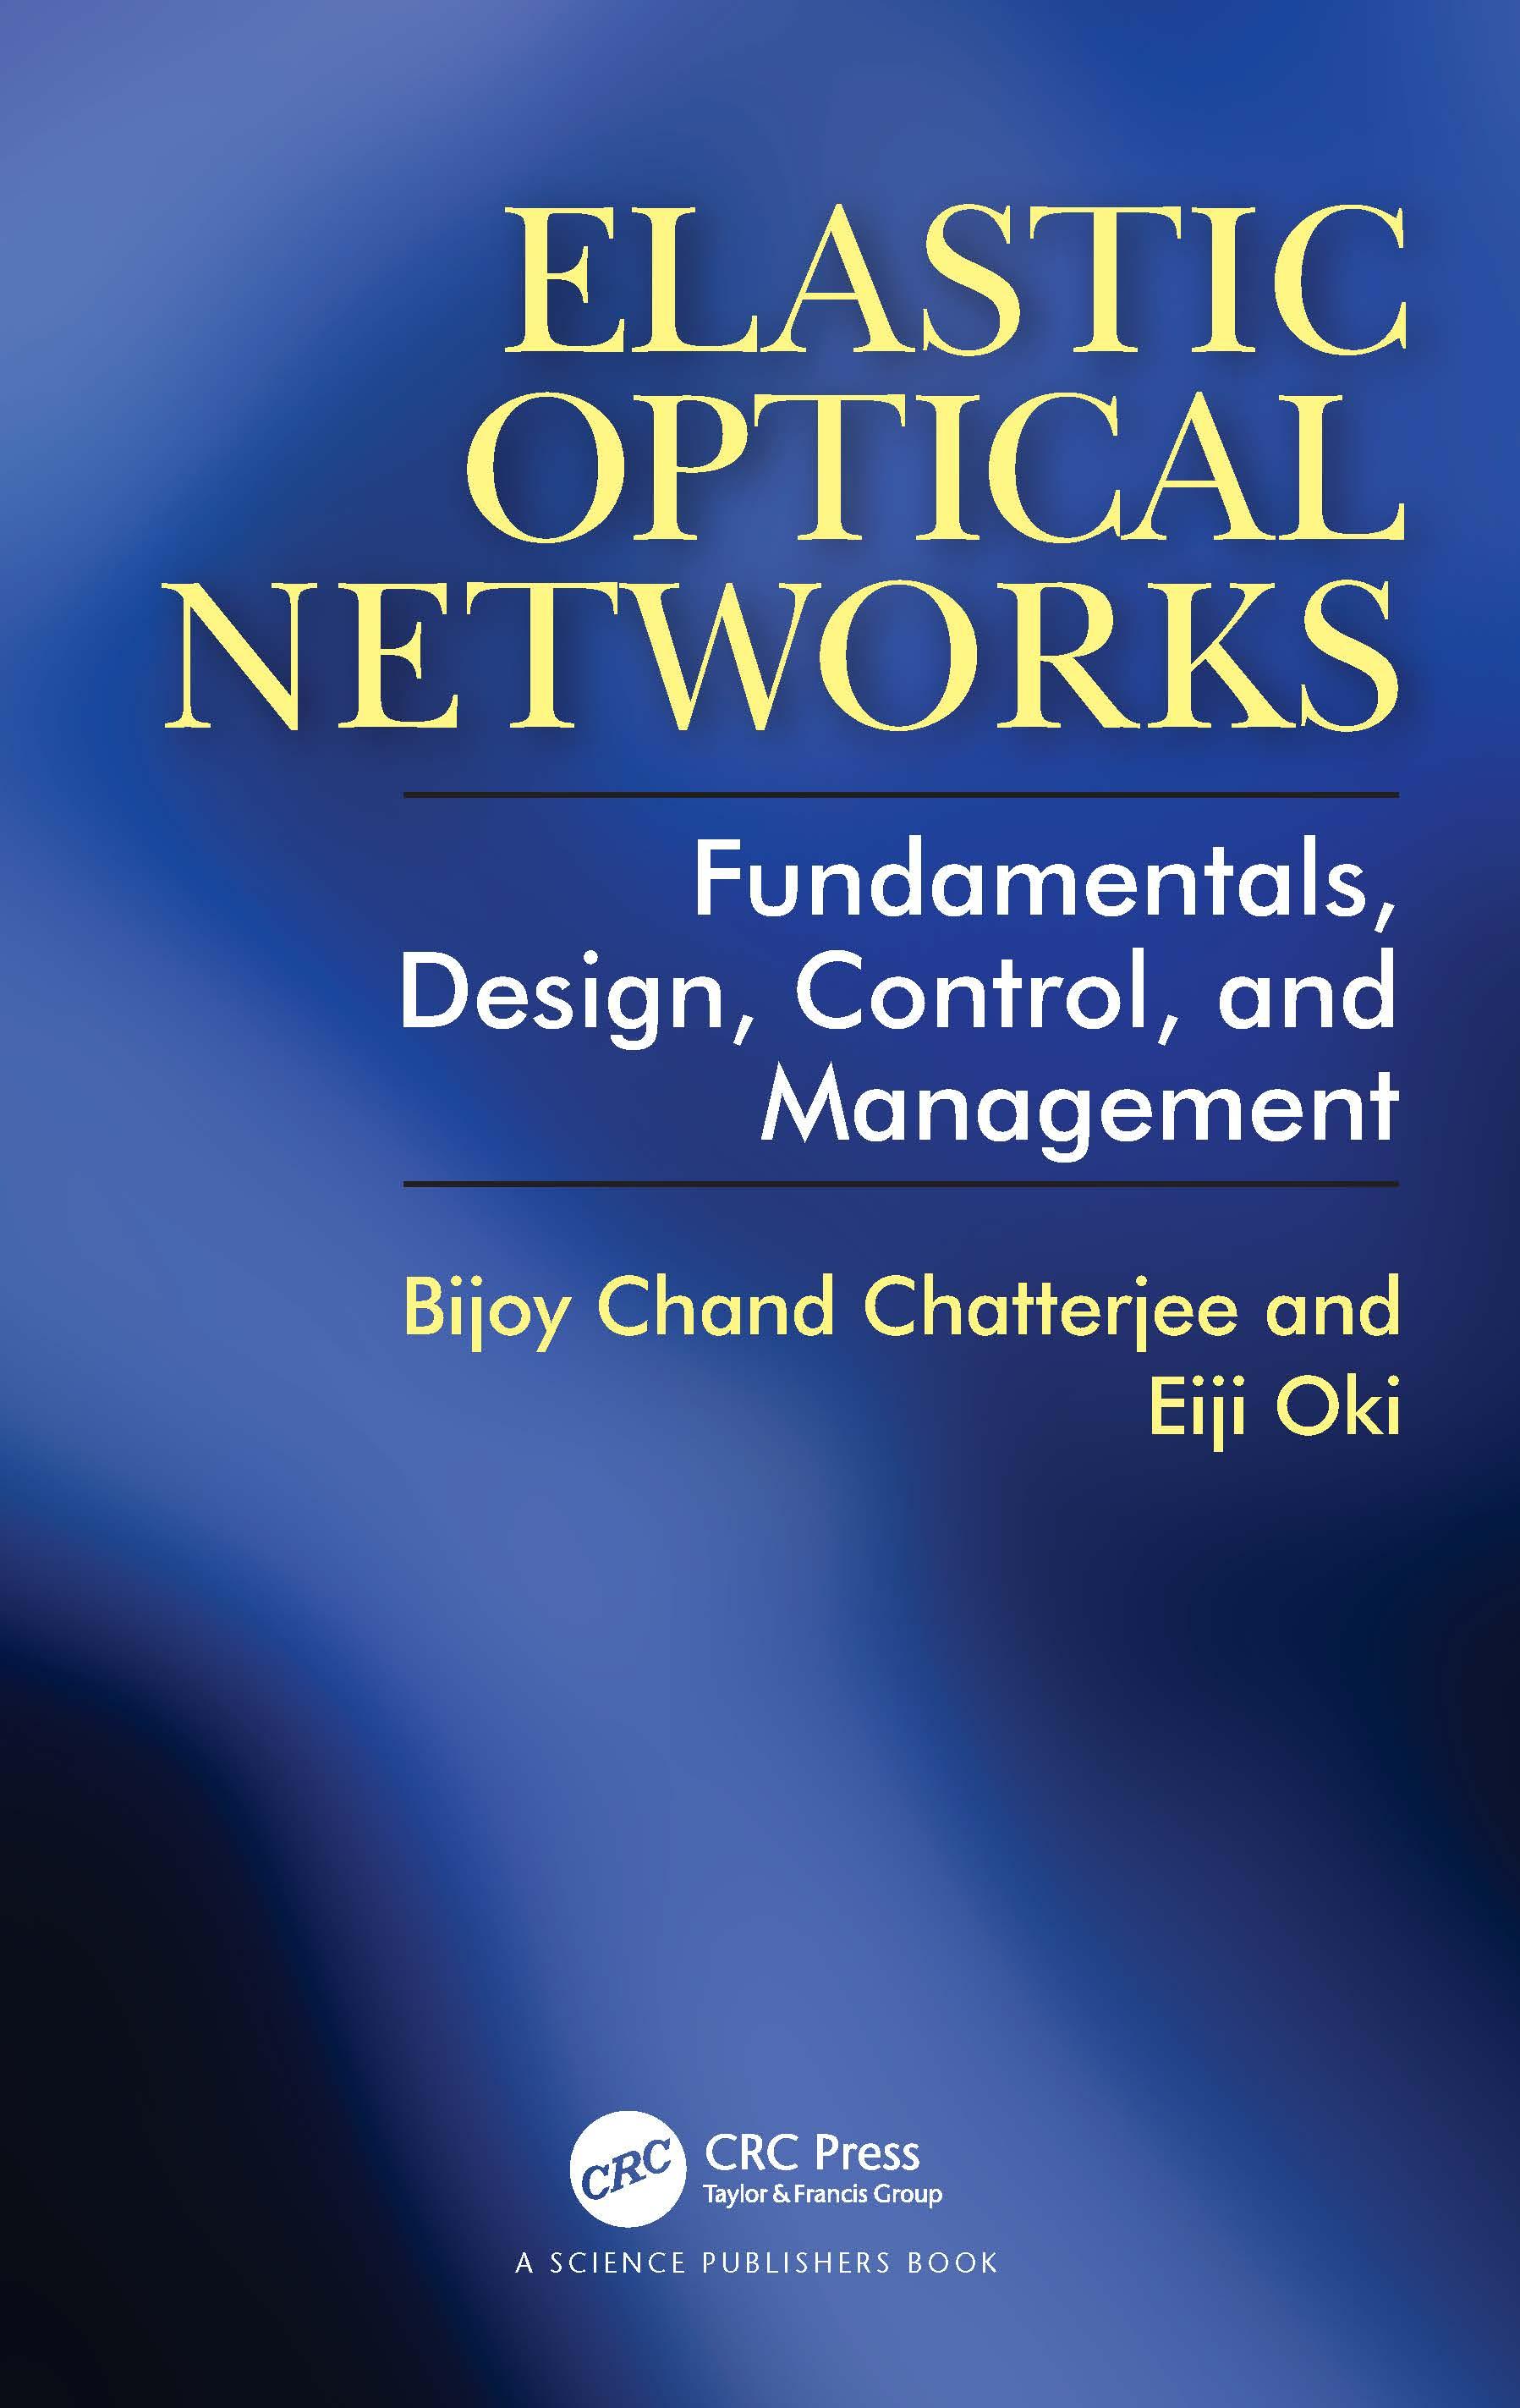 Elastic Optical Networks: Fundamentals, Design, Control, and Management book cover